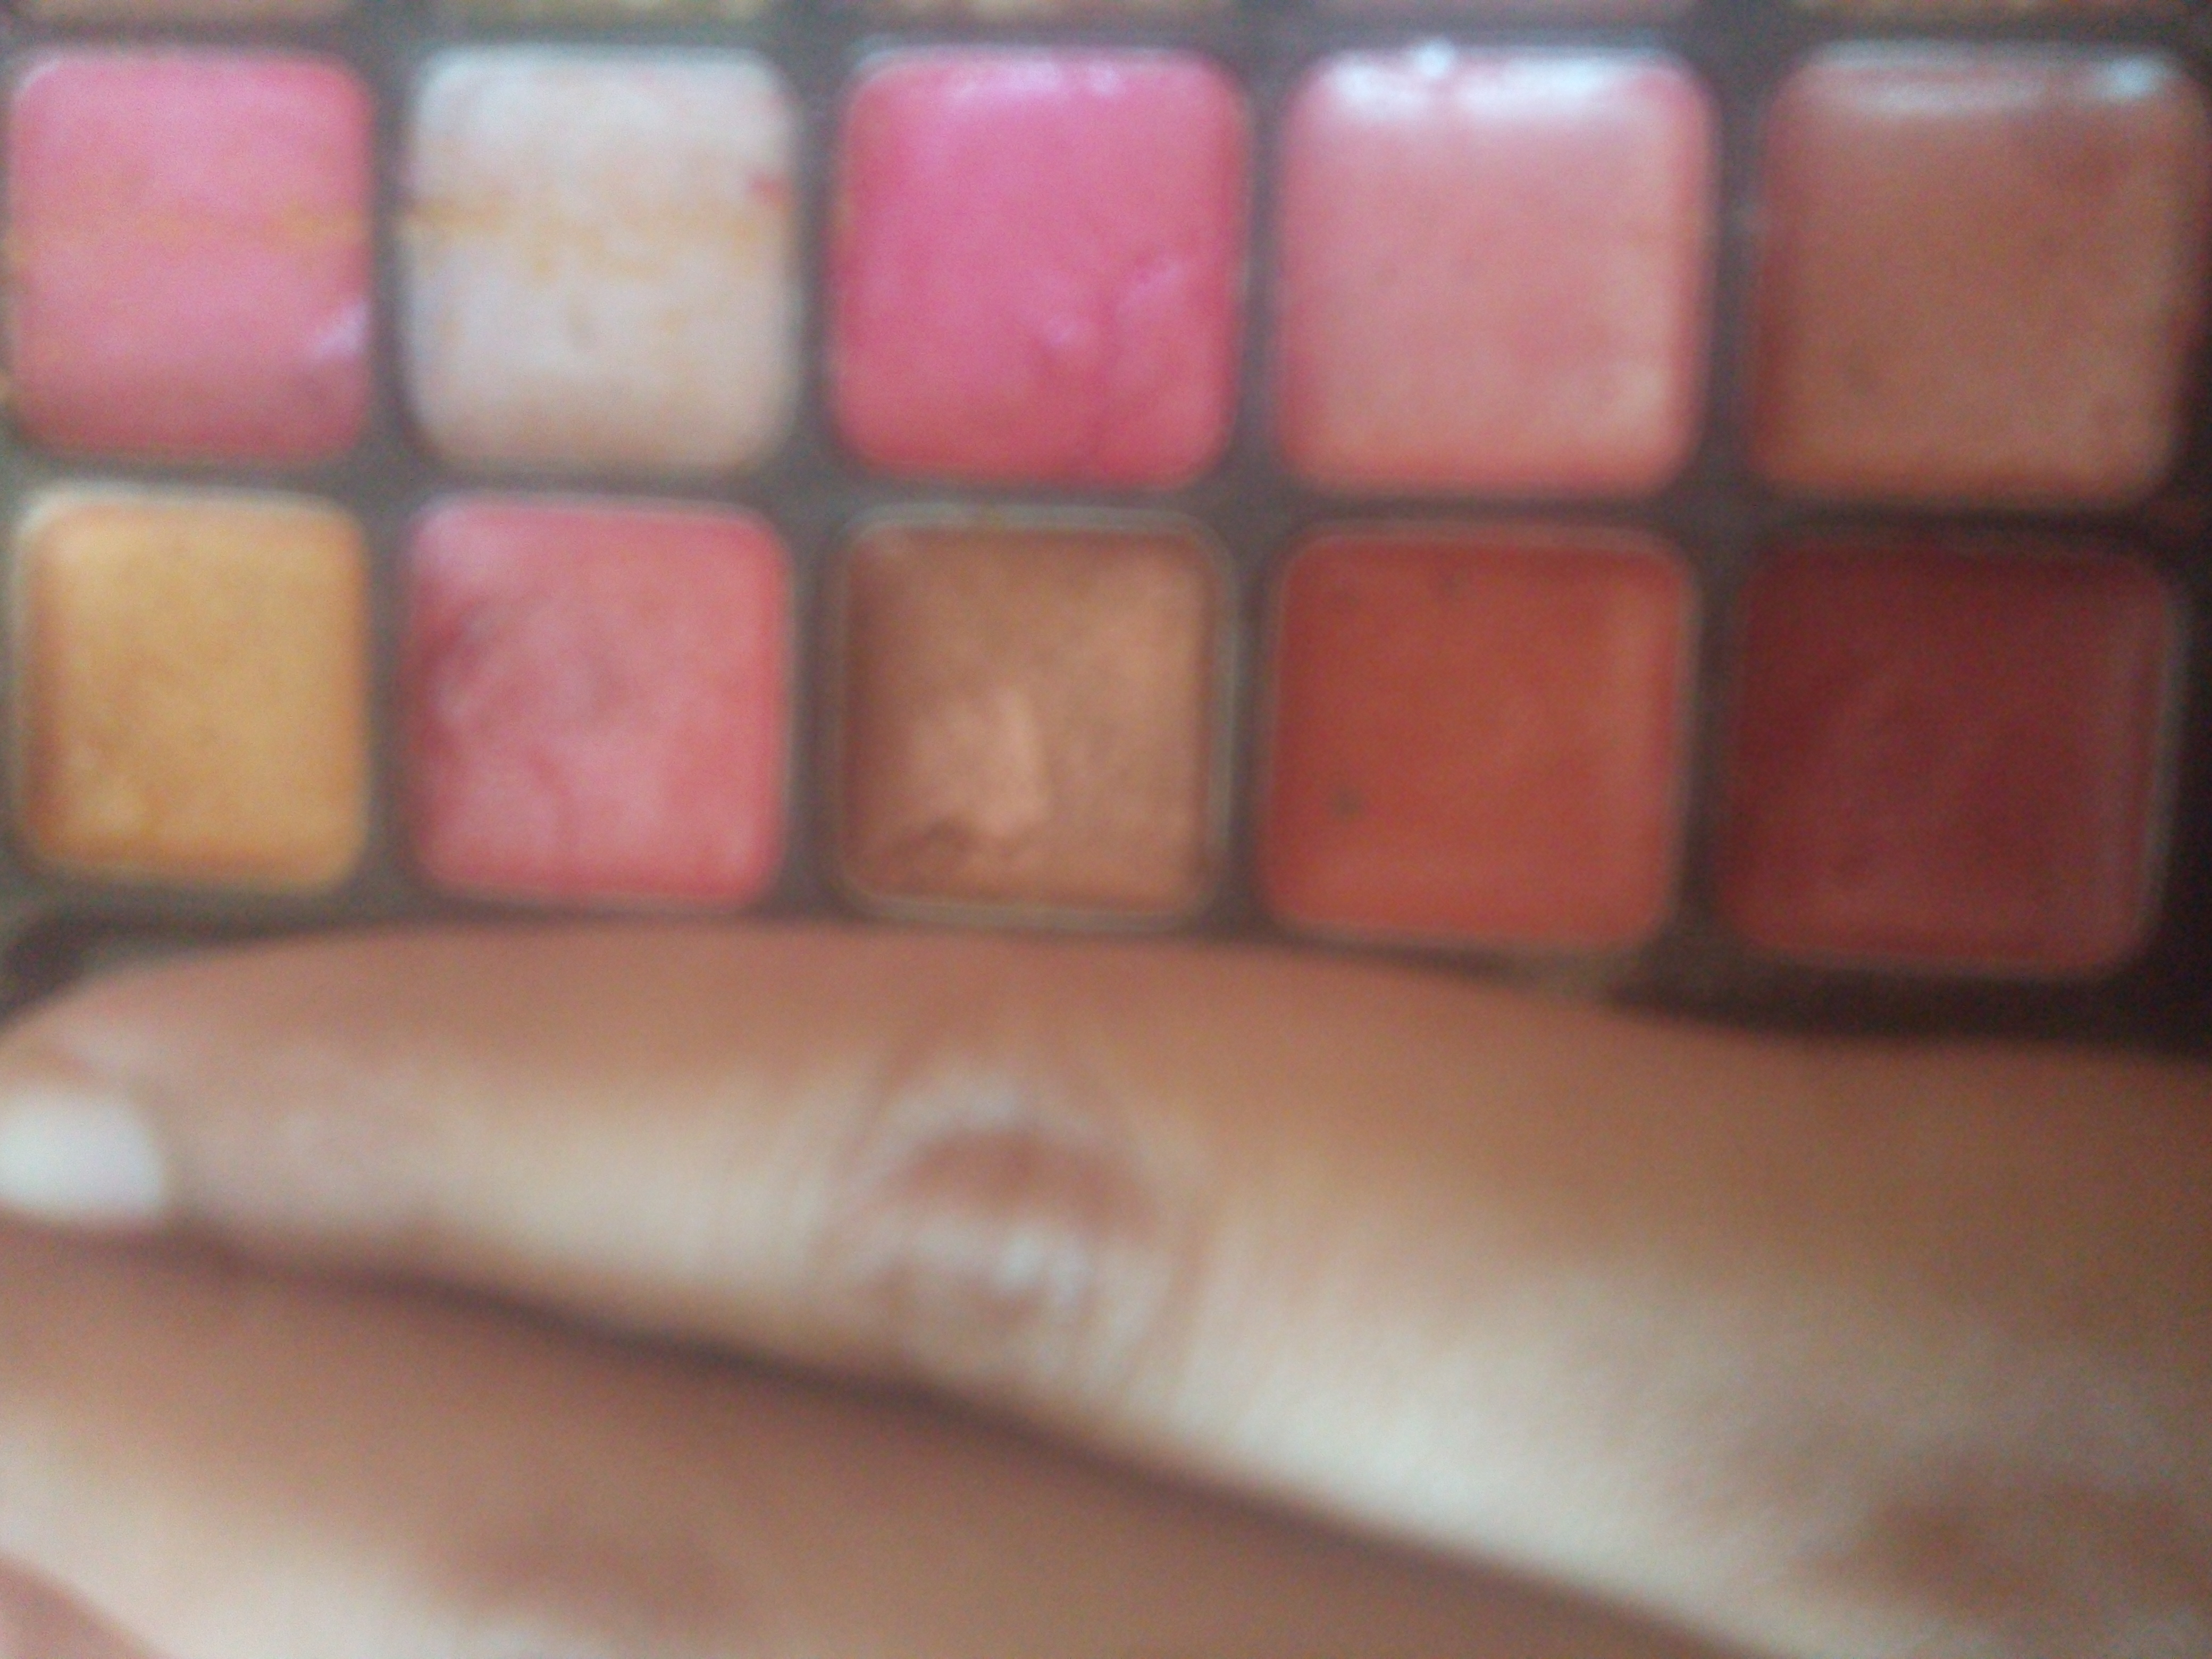 Anastasia Beverly Hills Lip Palette-Gorgeous shades-By pixie